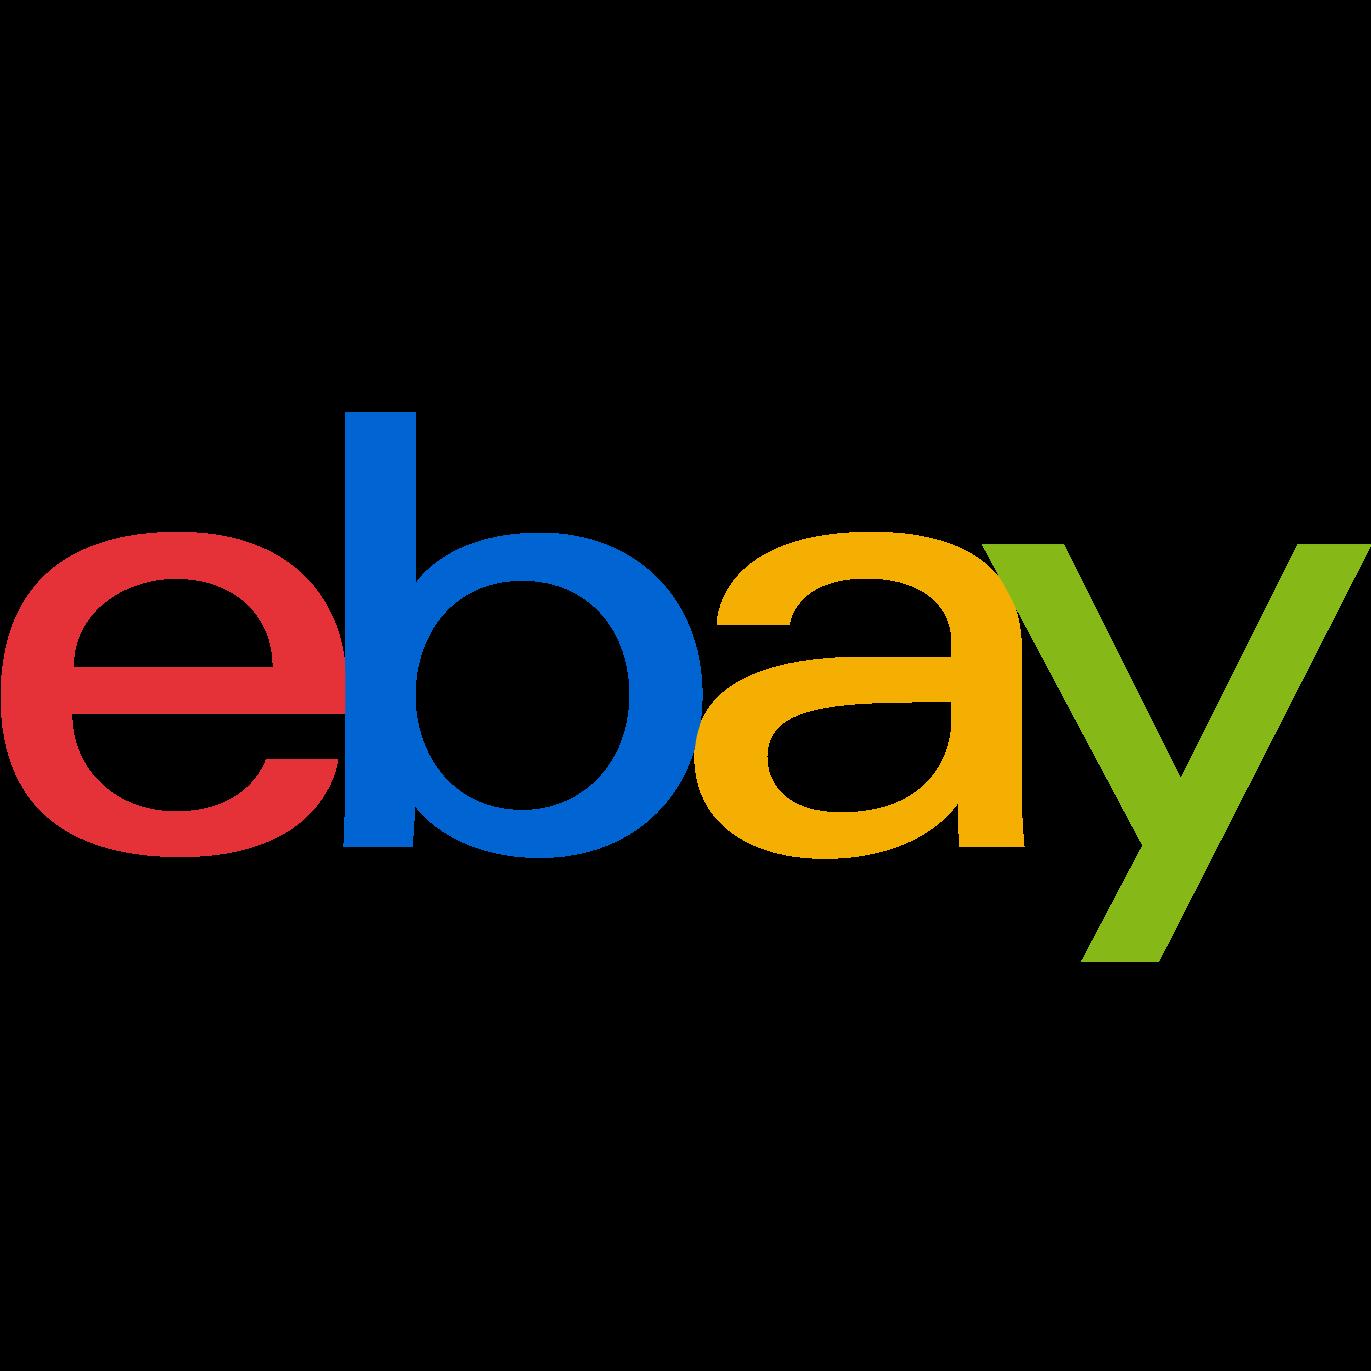 Ebay inbox